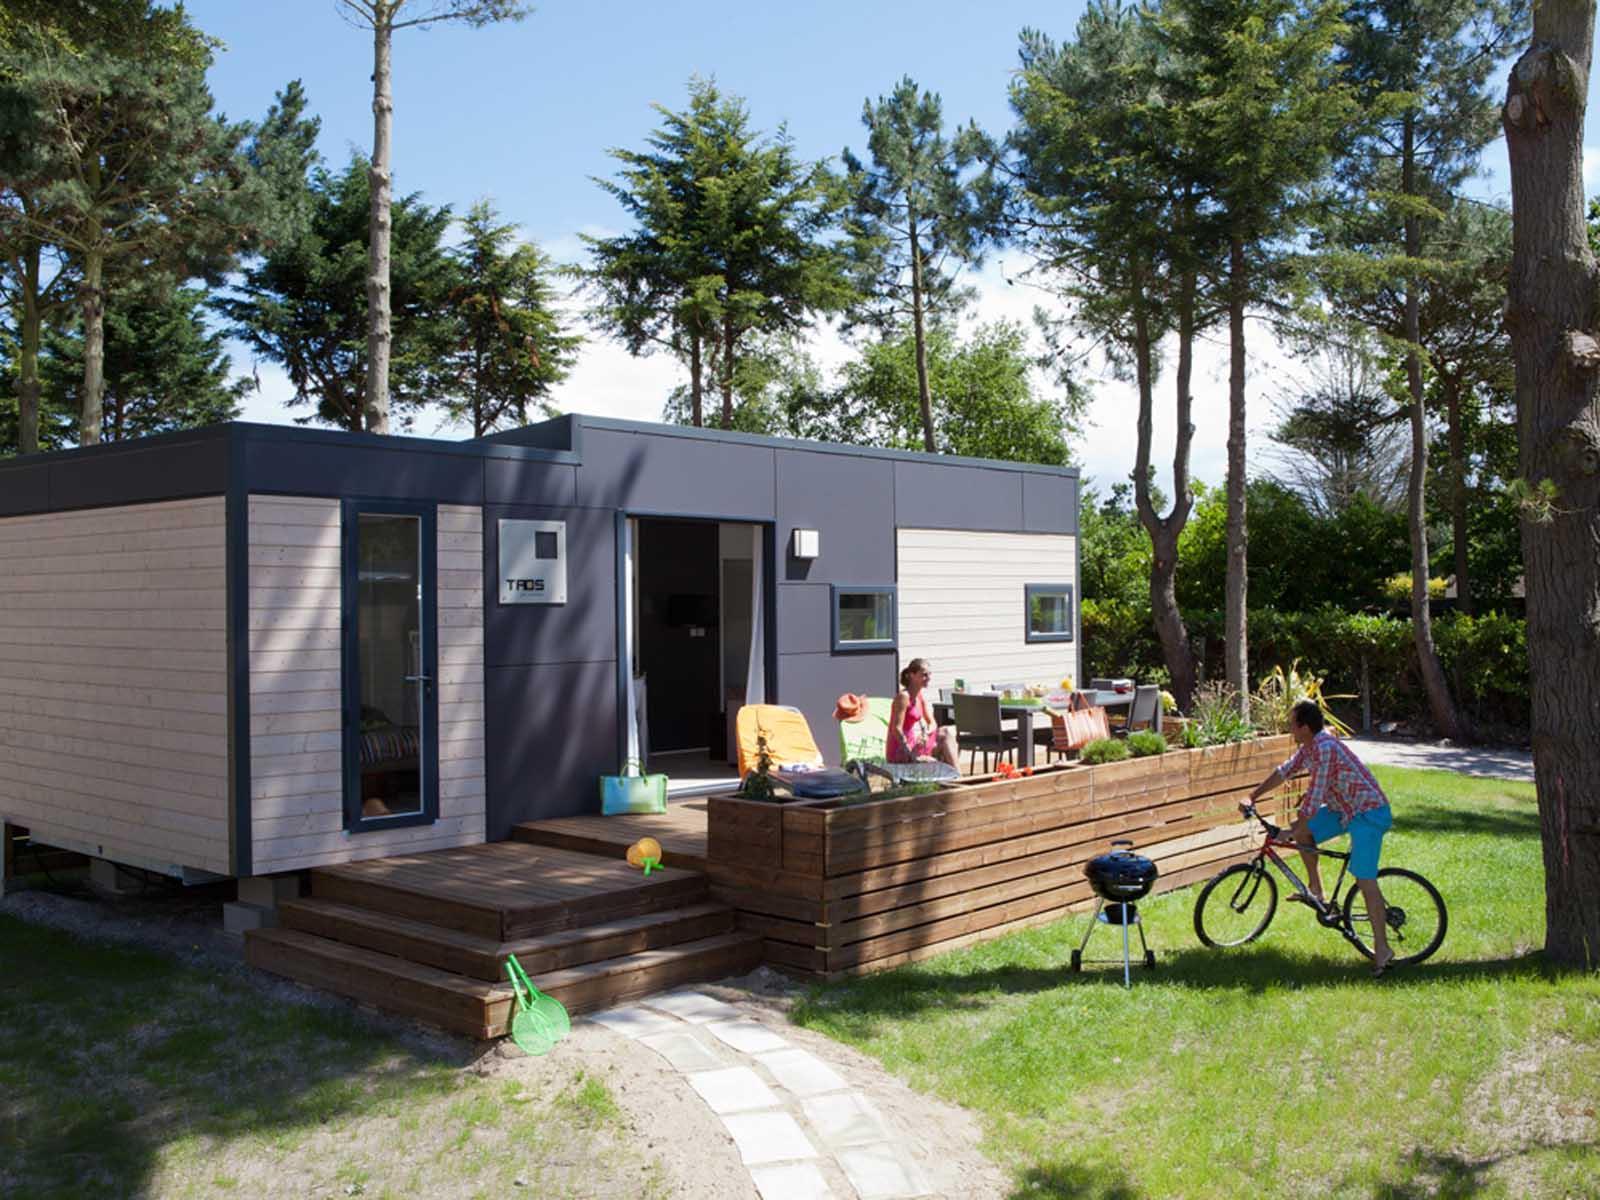 Camping Yelloh! Village les Pins, Erquy, Côtes-d'Armor